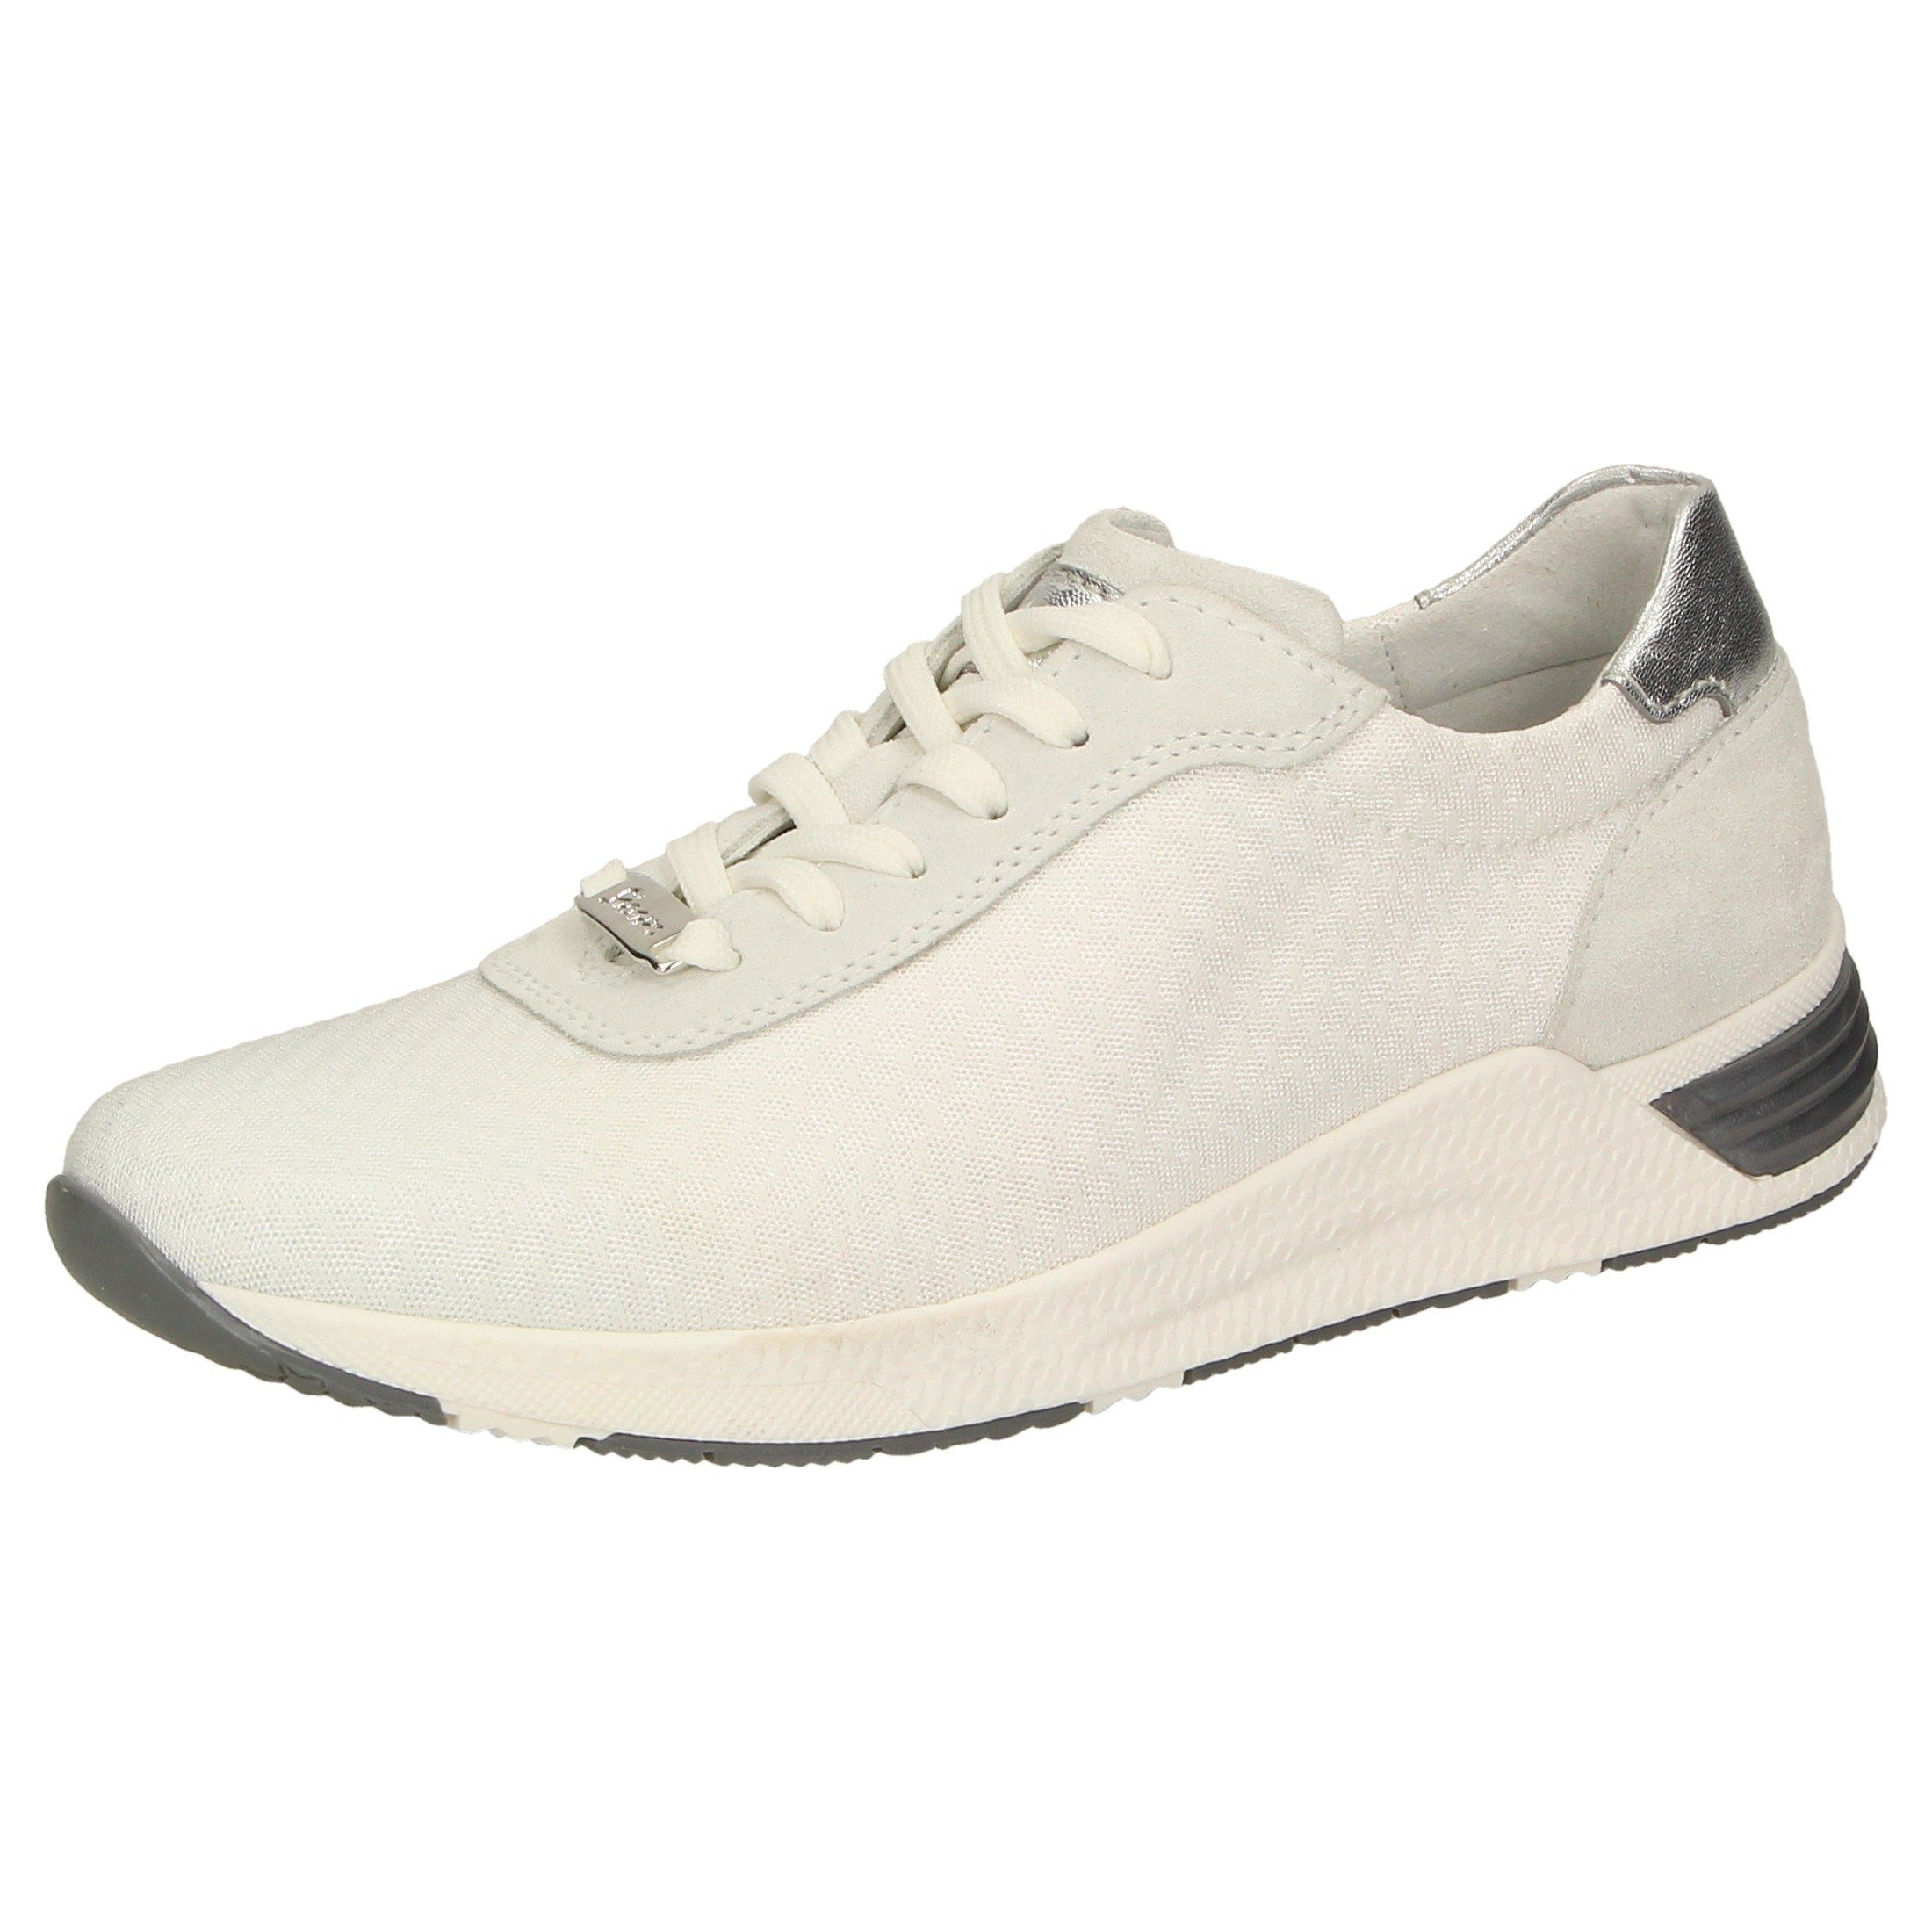 SIOUX »Natovia 700« Sneaker, Sneaker online kaufen | OTTO